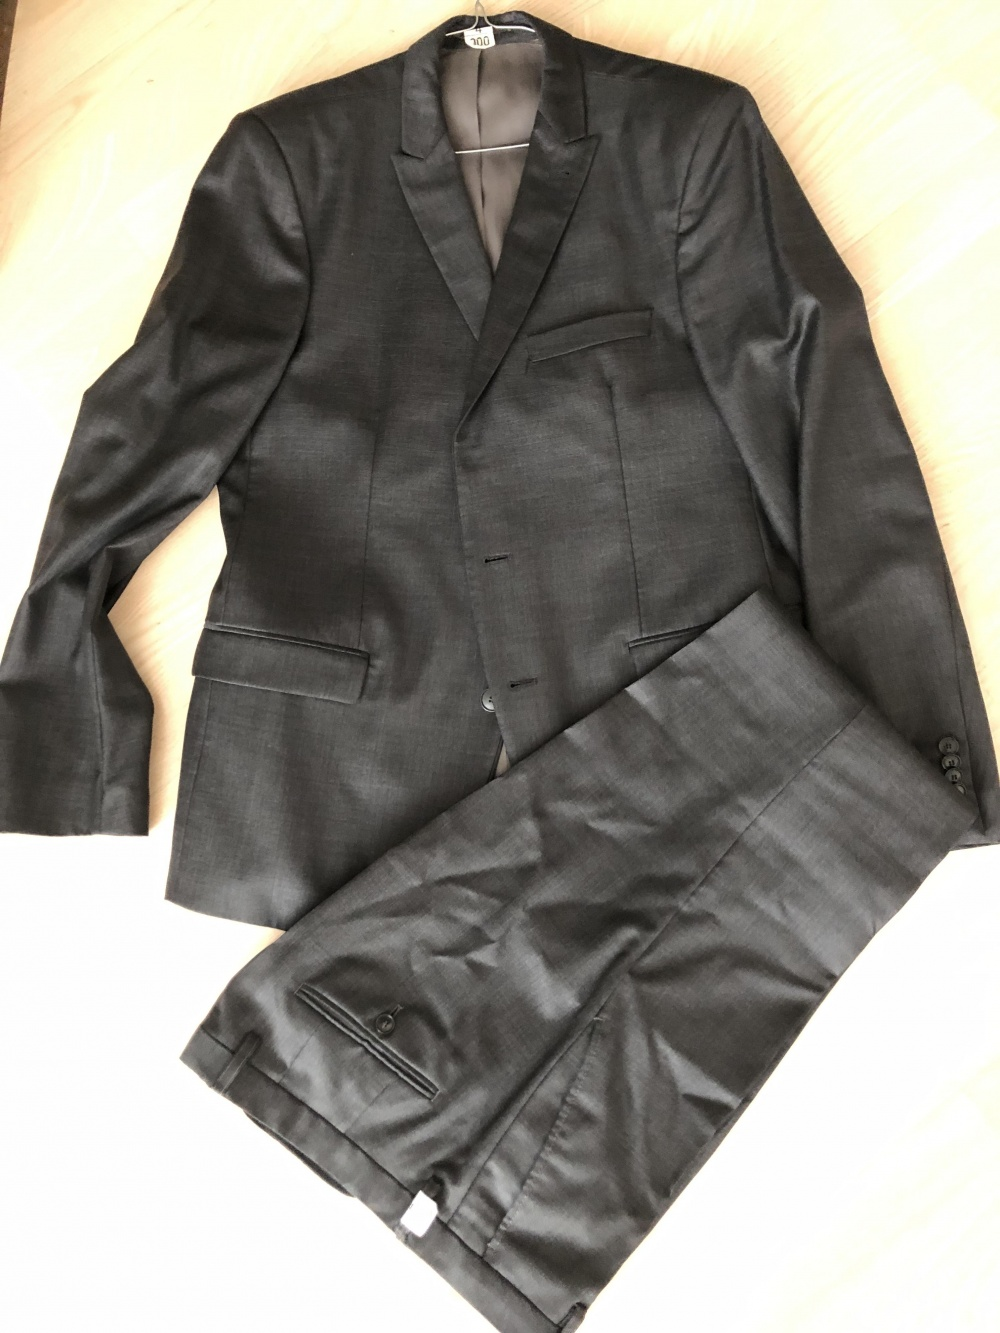 Мужской костюм Sarar 50 размер